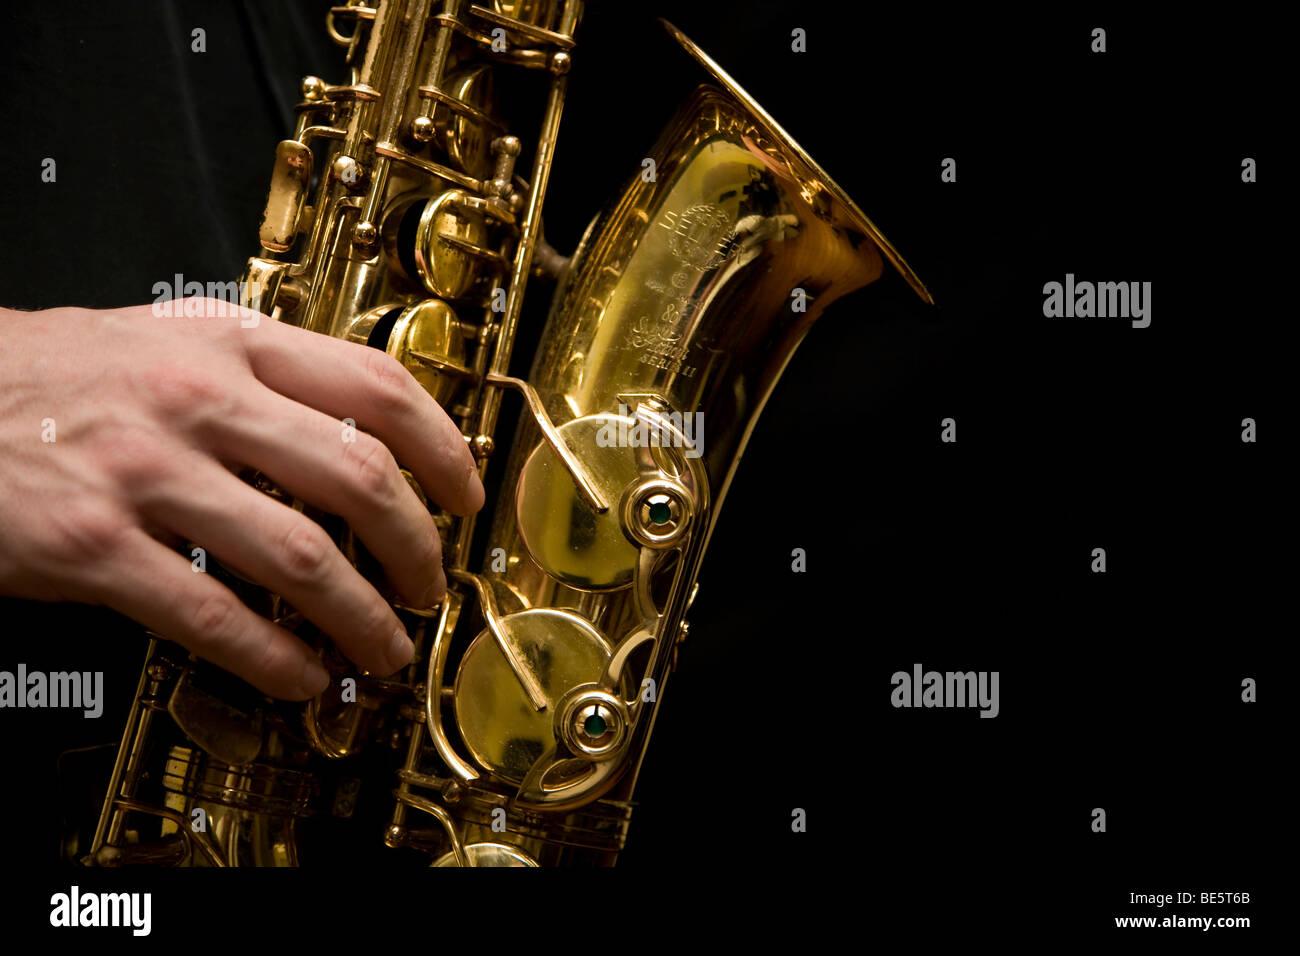 Alto Saxophone Stock Photos & Alto Saxophone Stock Images